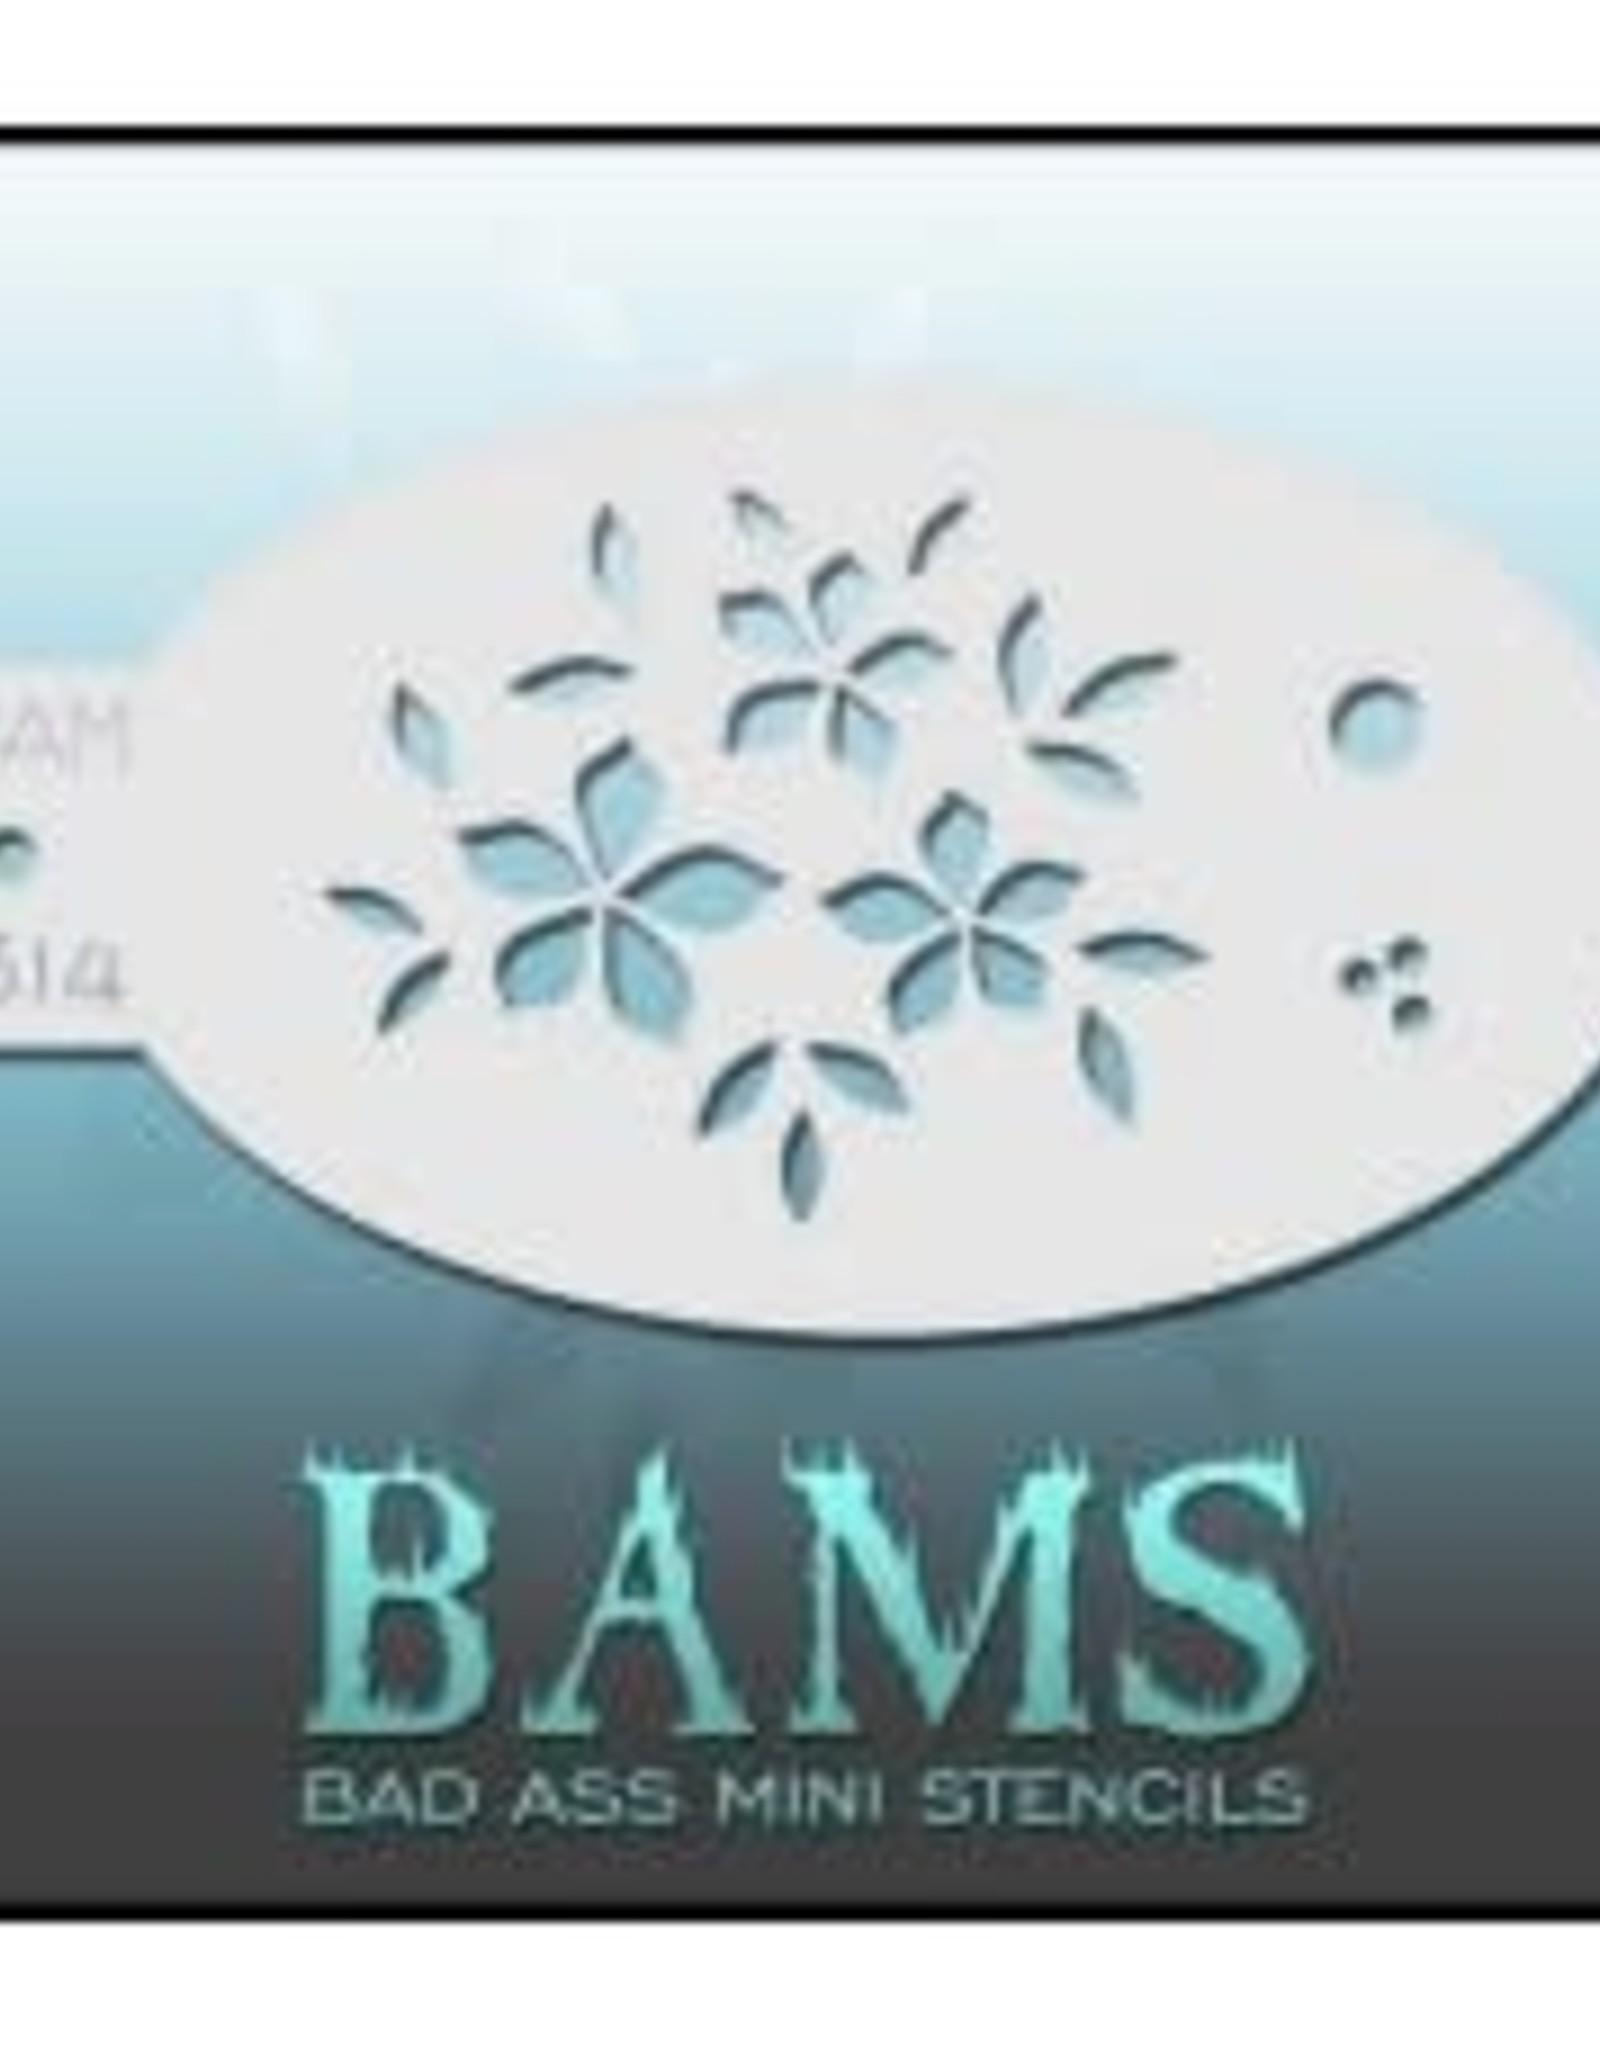 Bad Ass Stencils Bad Ass Mini Stencil - BAM1314